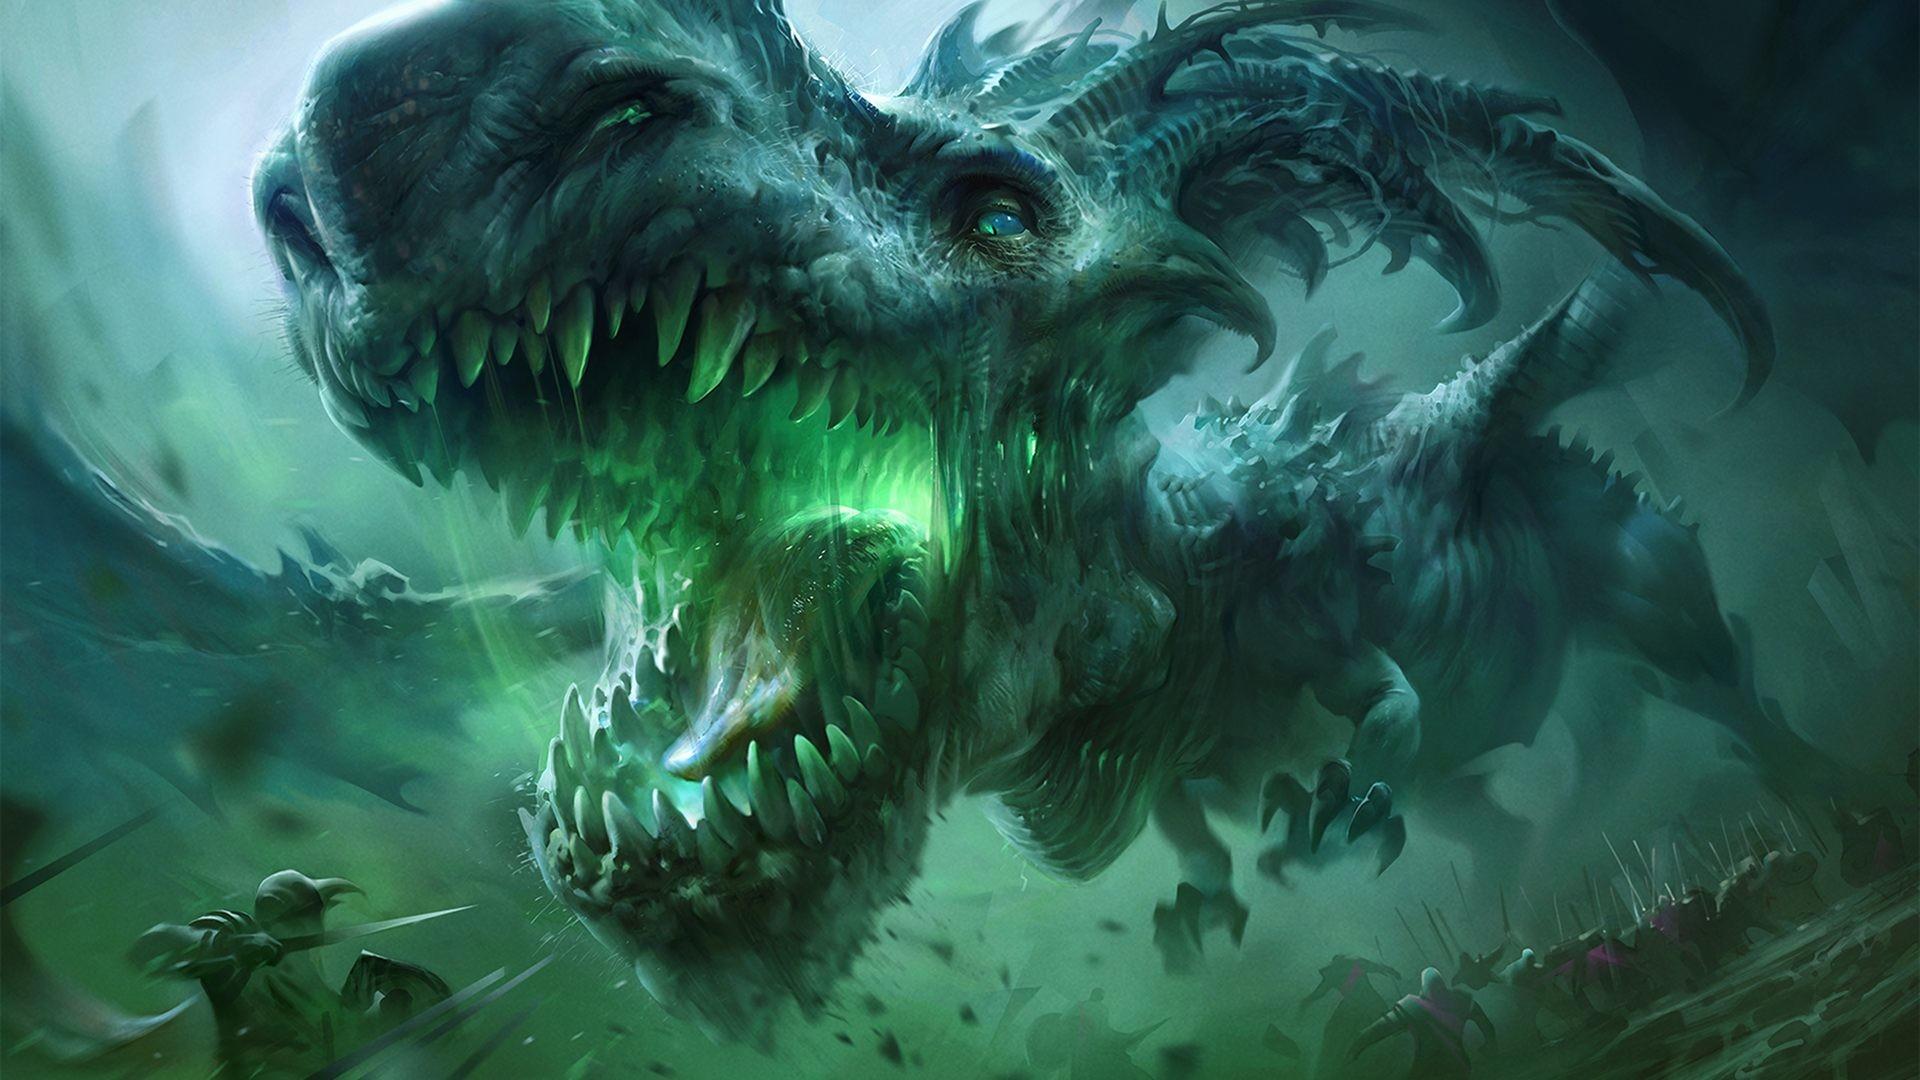 Fantasy Forest 3d Live Wallpaper Green Dragon Wallpaper 71 Images